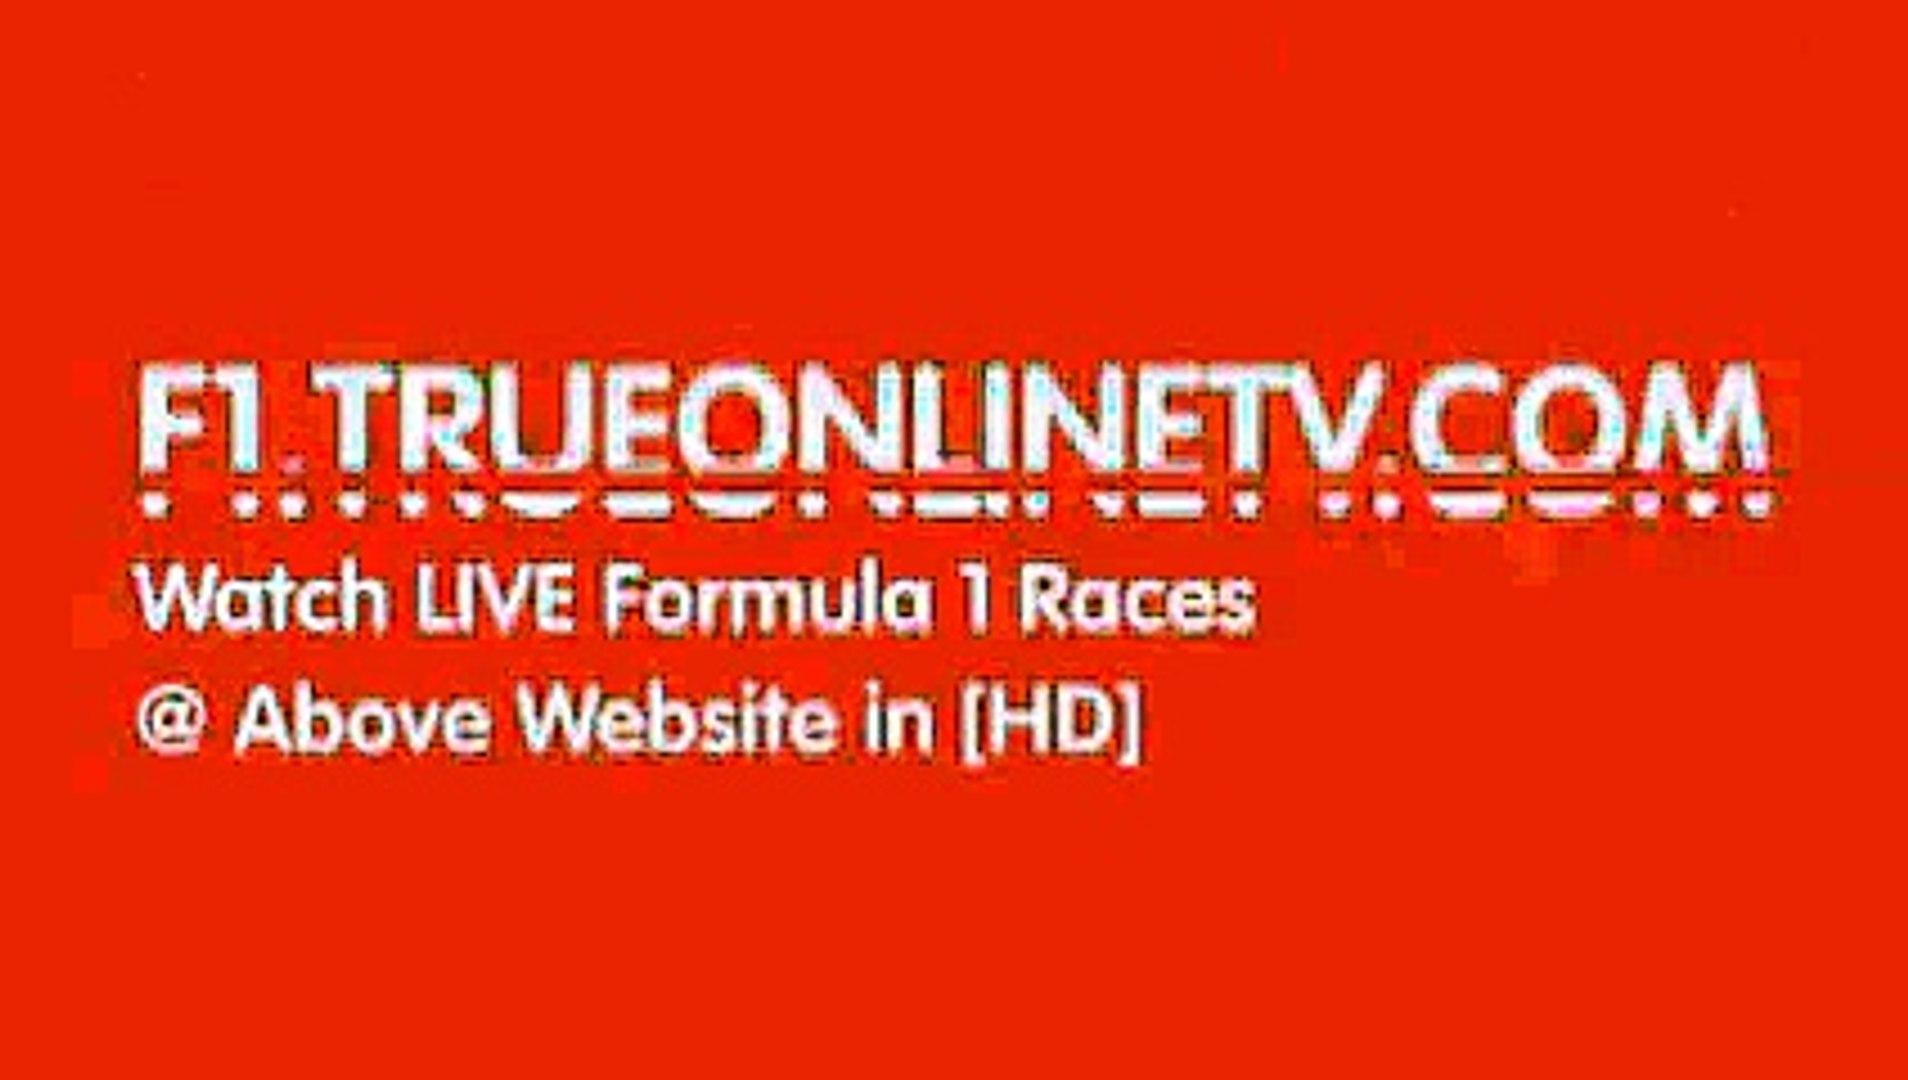 2015 austrian grand prix - historic f1 car race - zeltweg - austria - austrian - jean alesi - michae